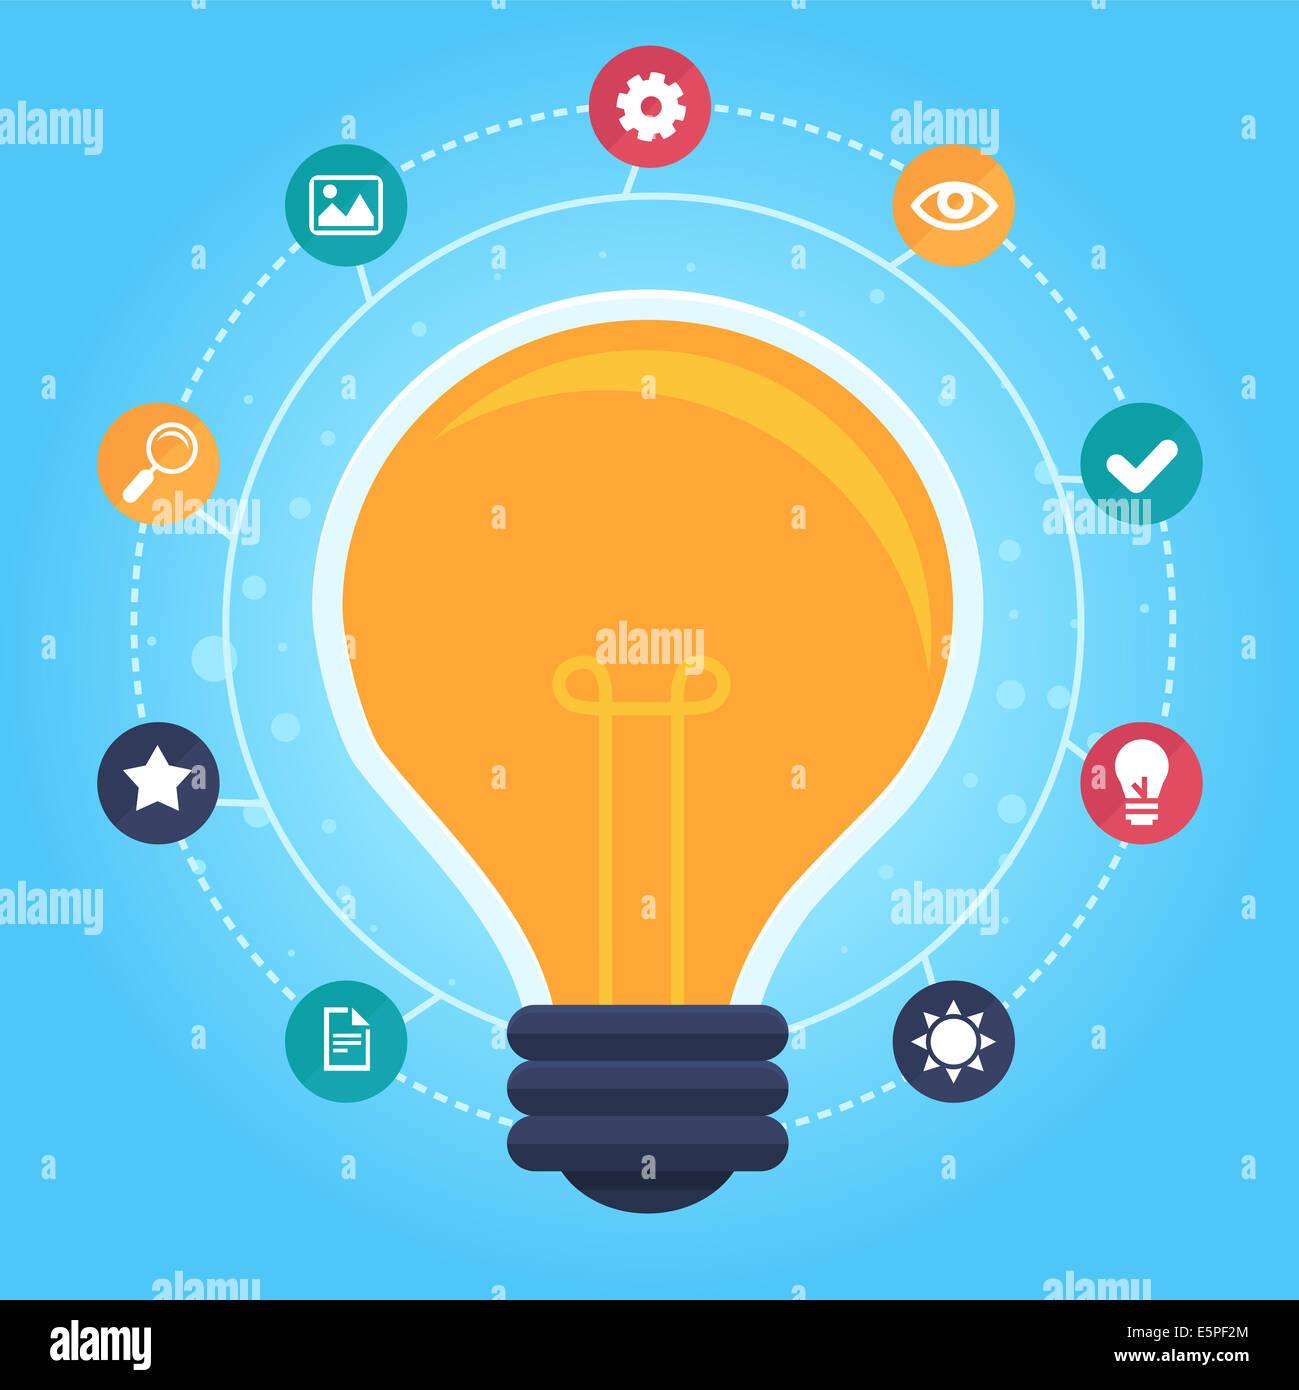 Kreative Idee Infografik - Design-Elemente im flachen Stil - Grafik-Designprozess Stockbild